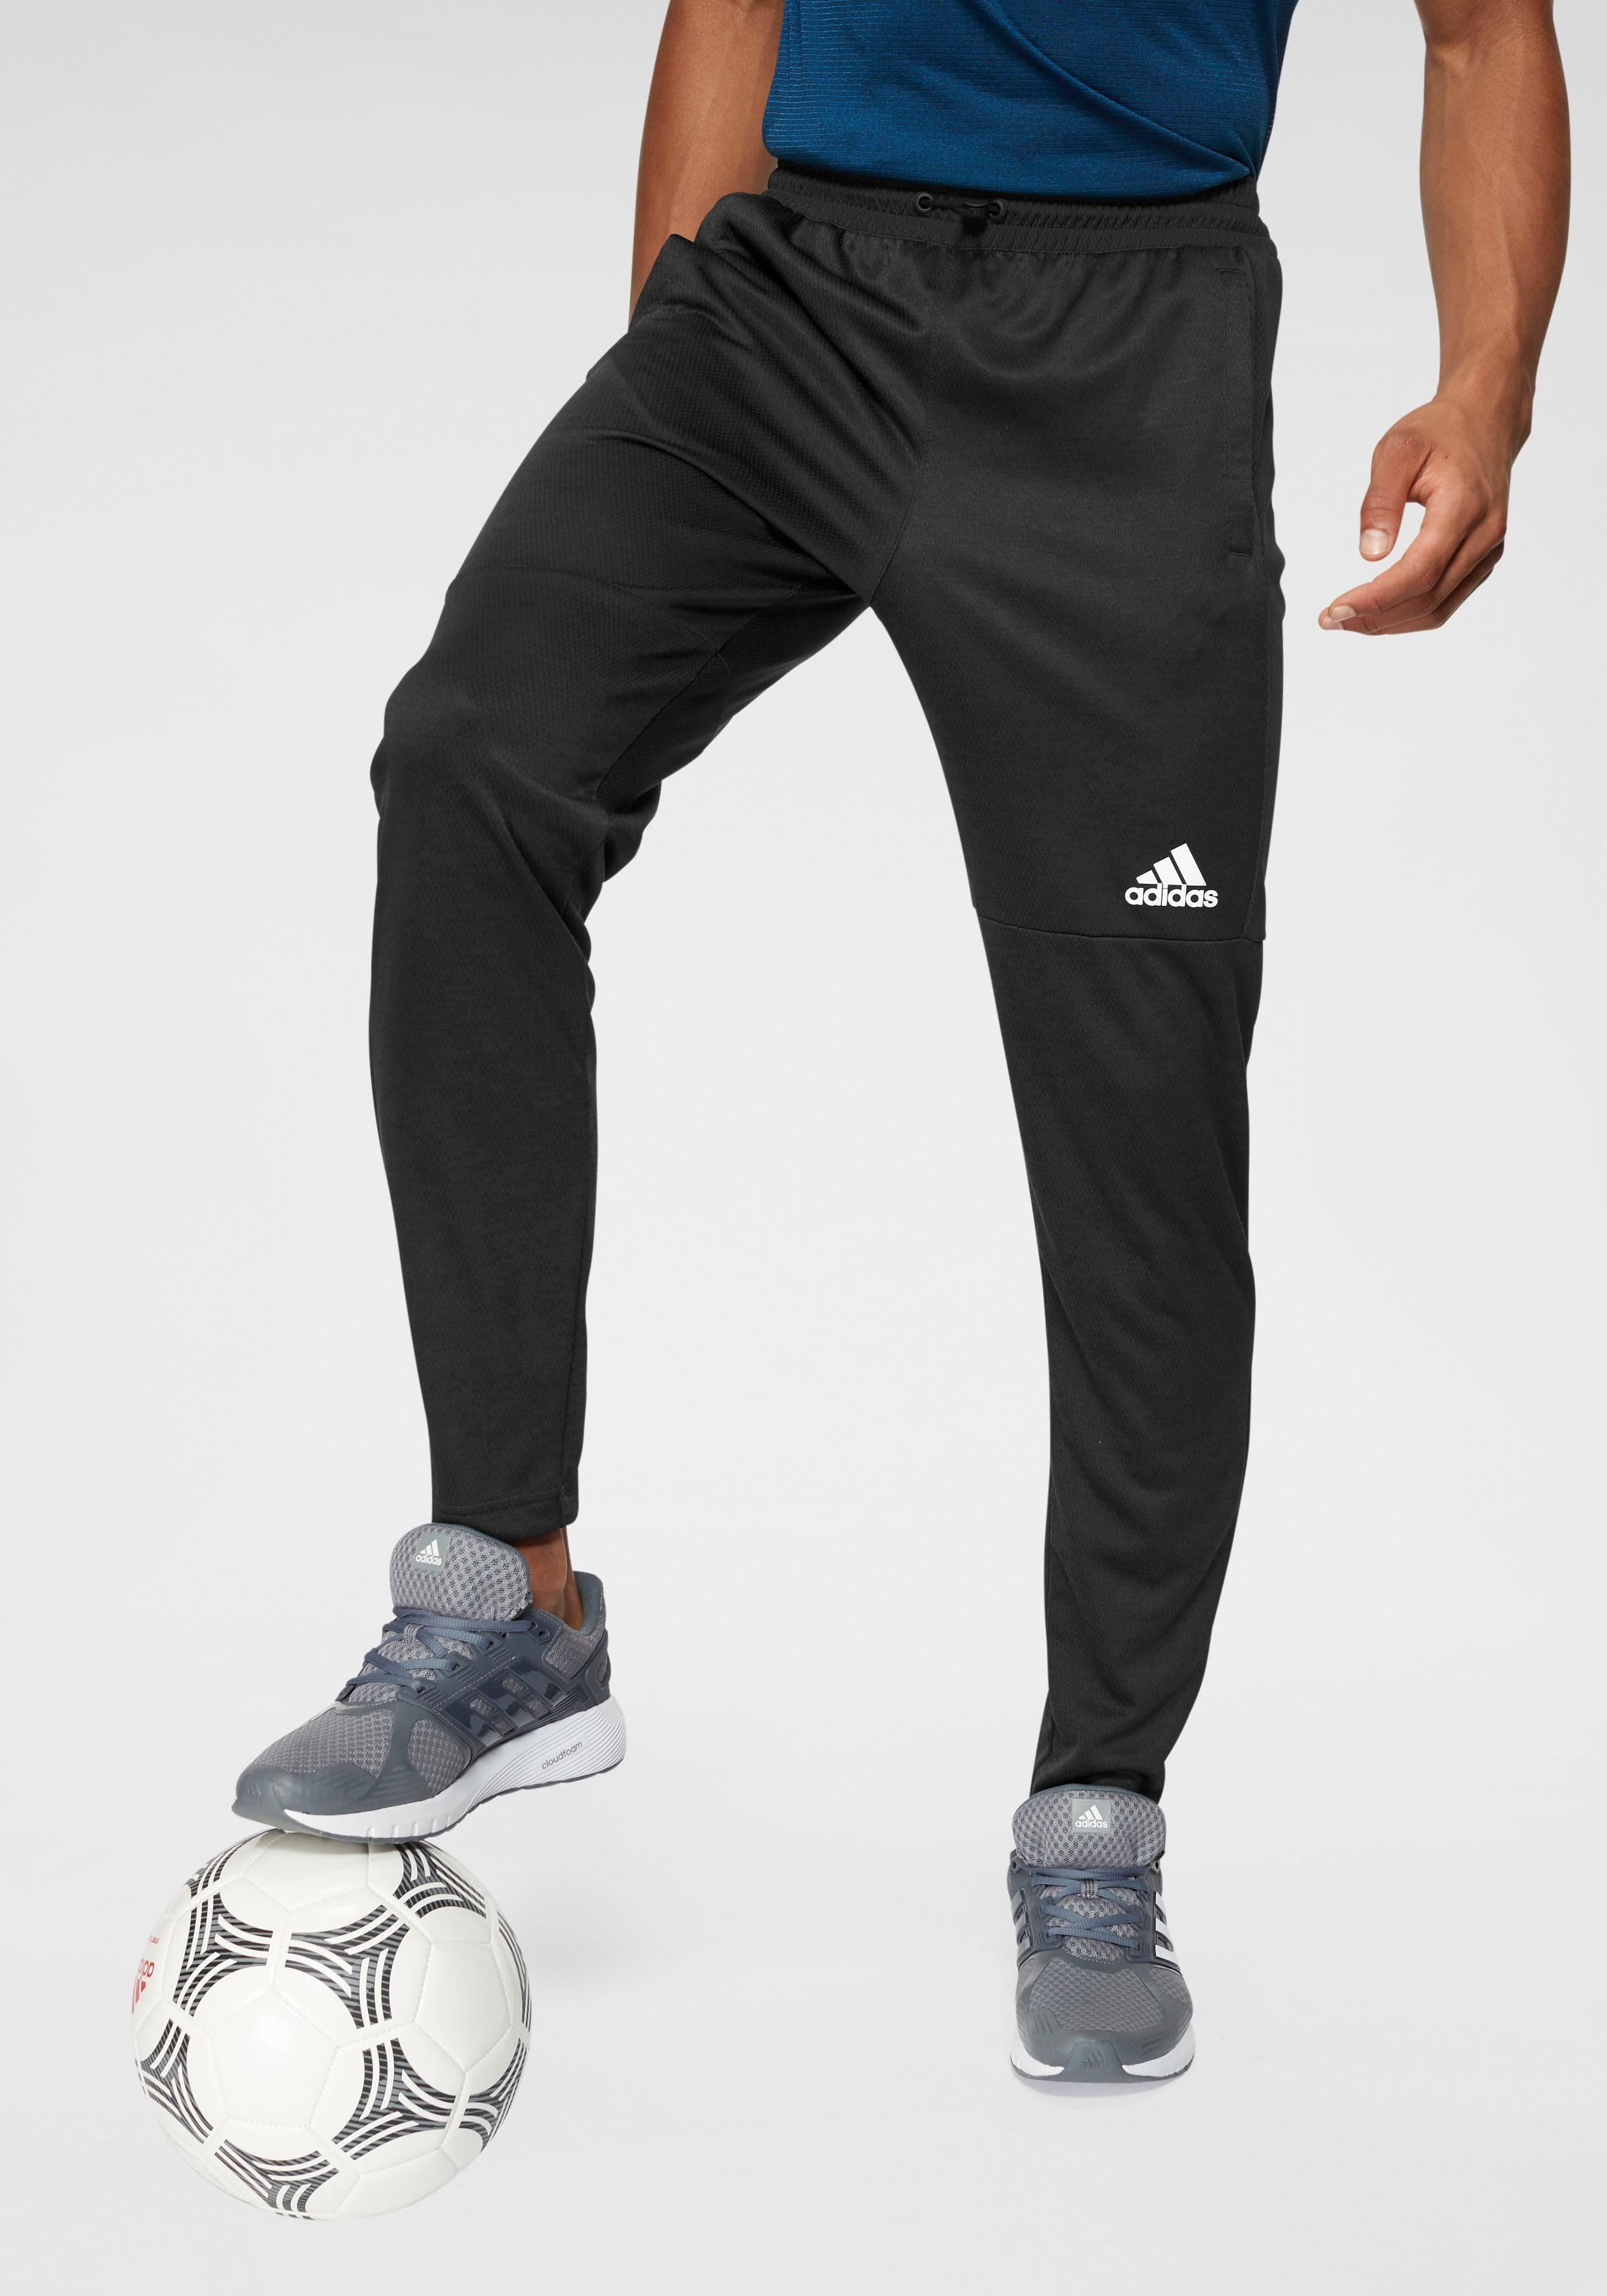 adidas Performance Lite Pant Jogginghose Schwarz Herren